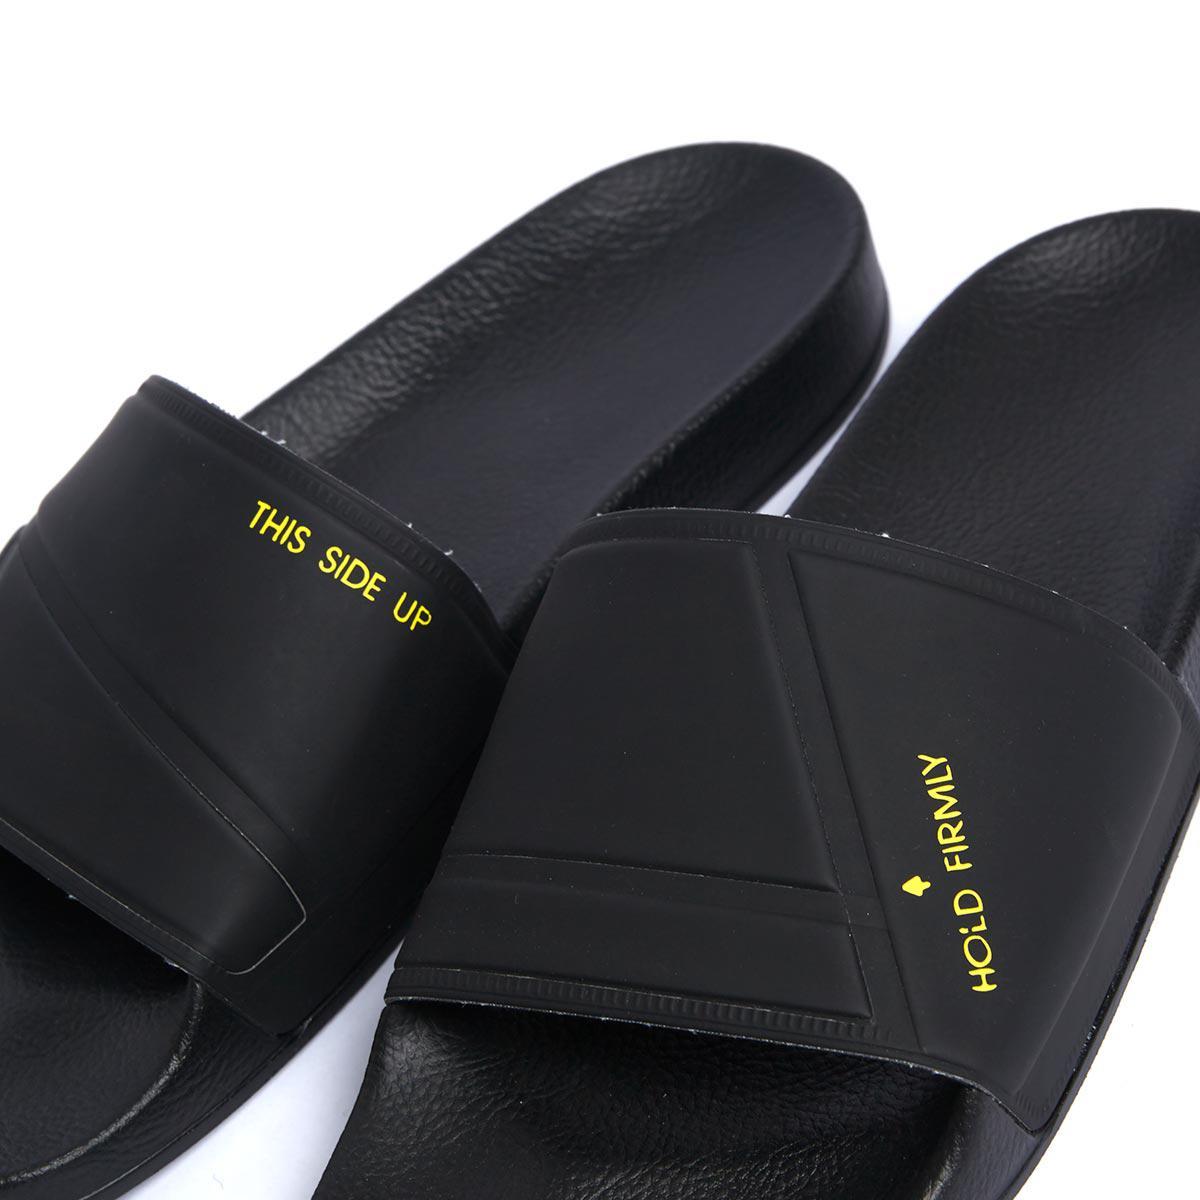 4e08fd77c1f7 Lyst - adidas By Raf Simons Bunny Adilette Rubber Slides in Black ...